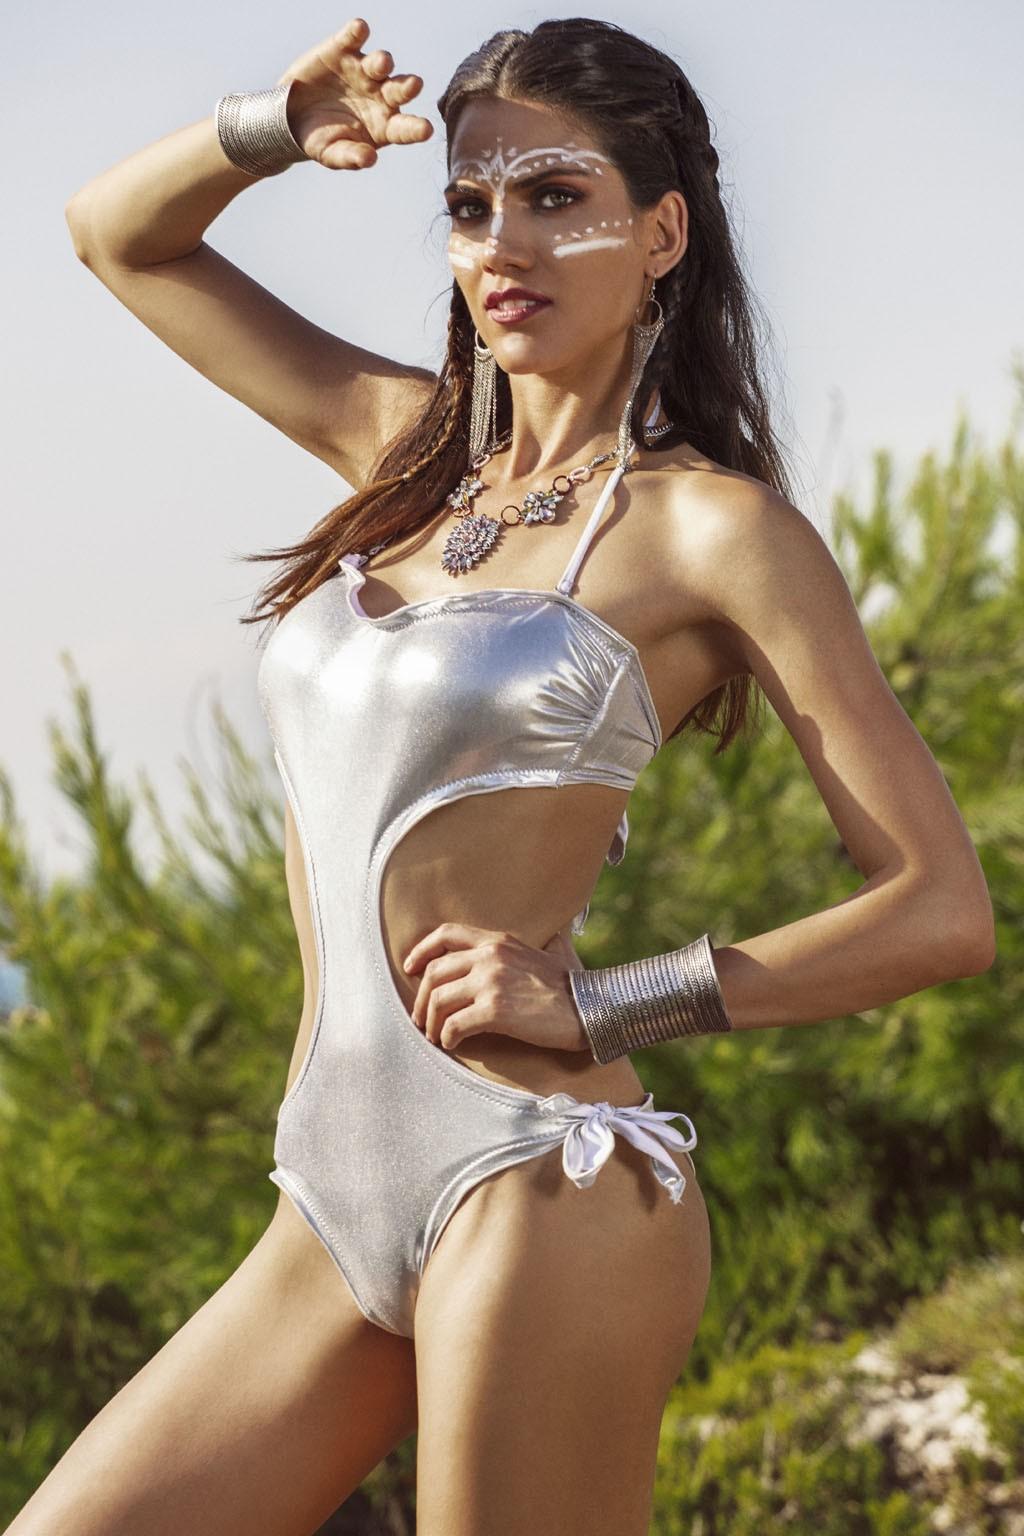 Trikini donna argentato con bretelle sottili e piccola rouge Sweet Years.